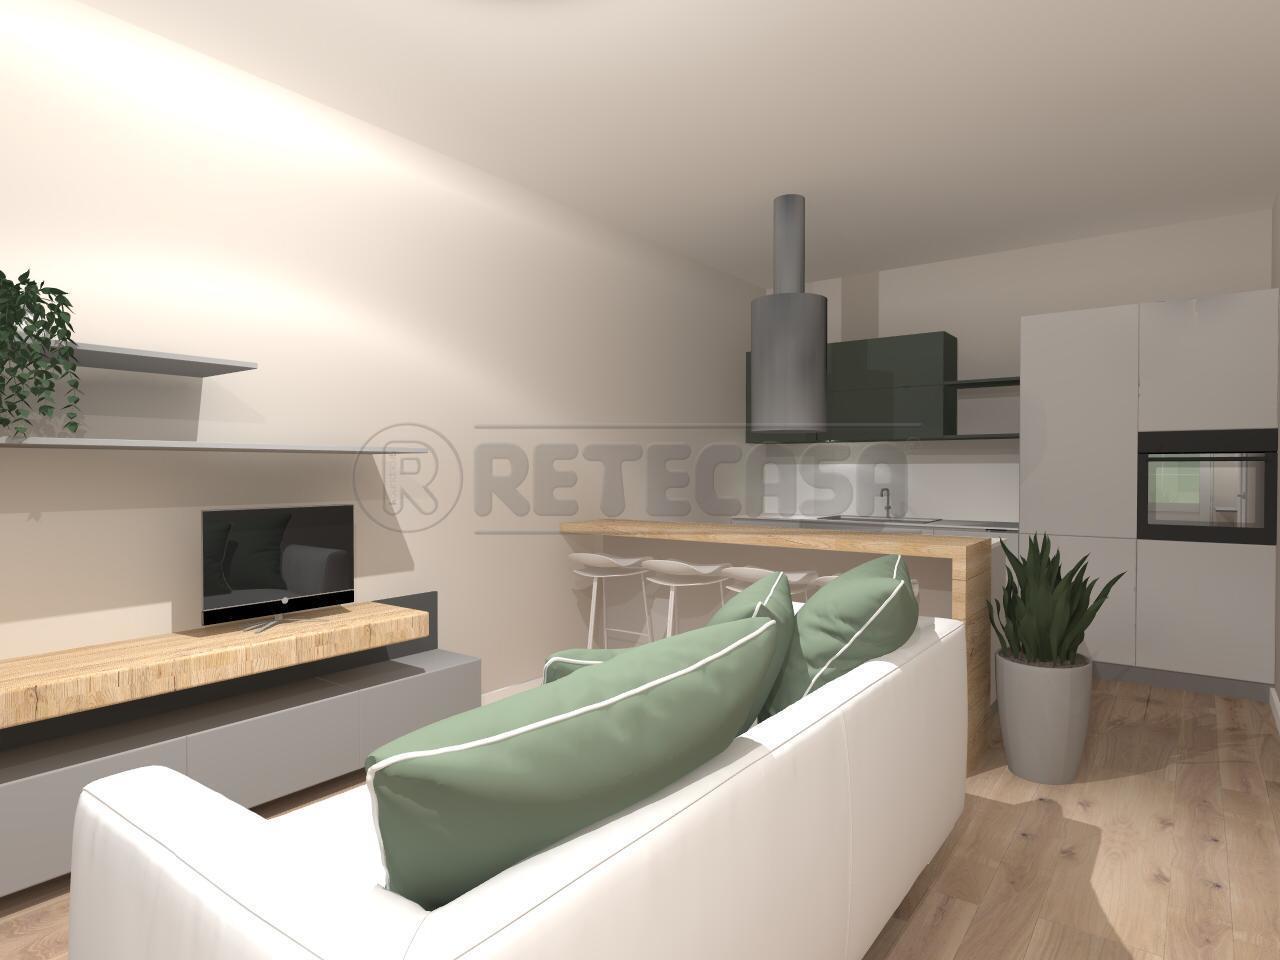 Appartamento - Miniapp.+mansarda a Ponticelli, Santa Maria a Monte